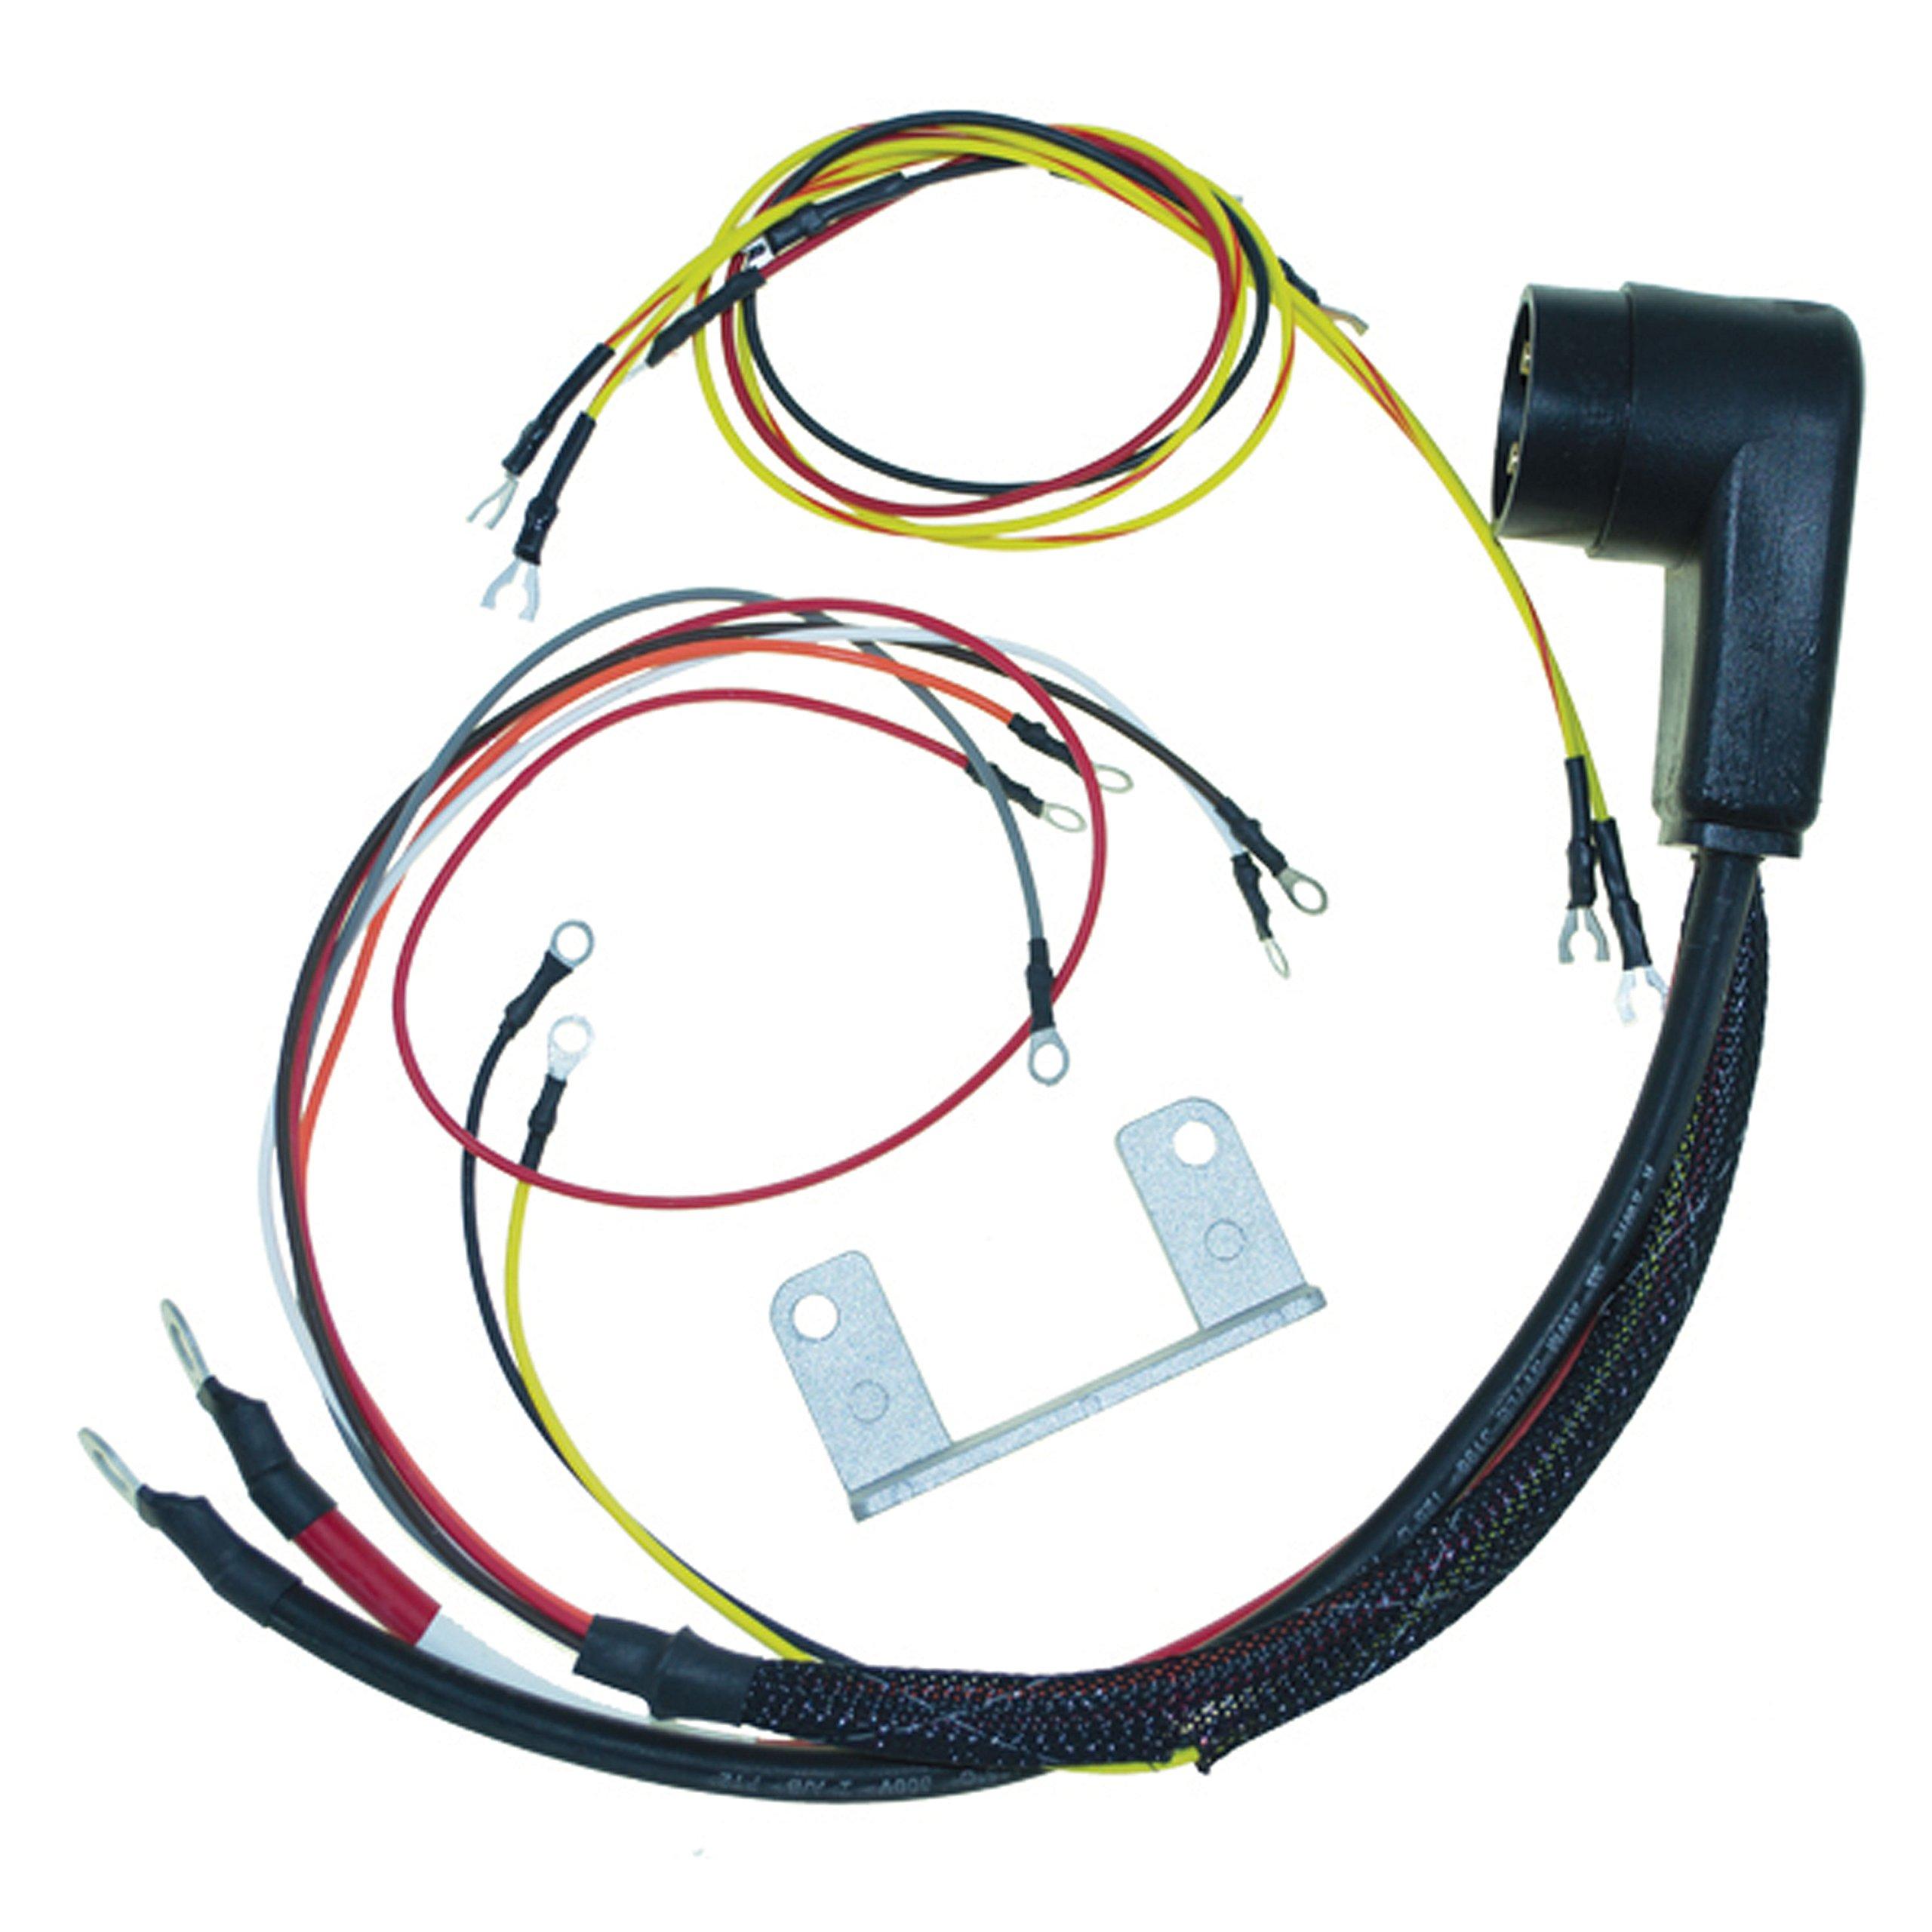 CDI Electronics 414-2770 Mercury/Mariner Wiring Harness-2/4/6 Cyl. (1966-1981) by CDI Electronics